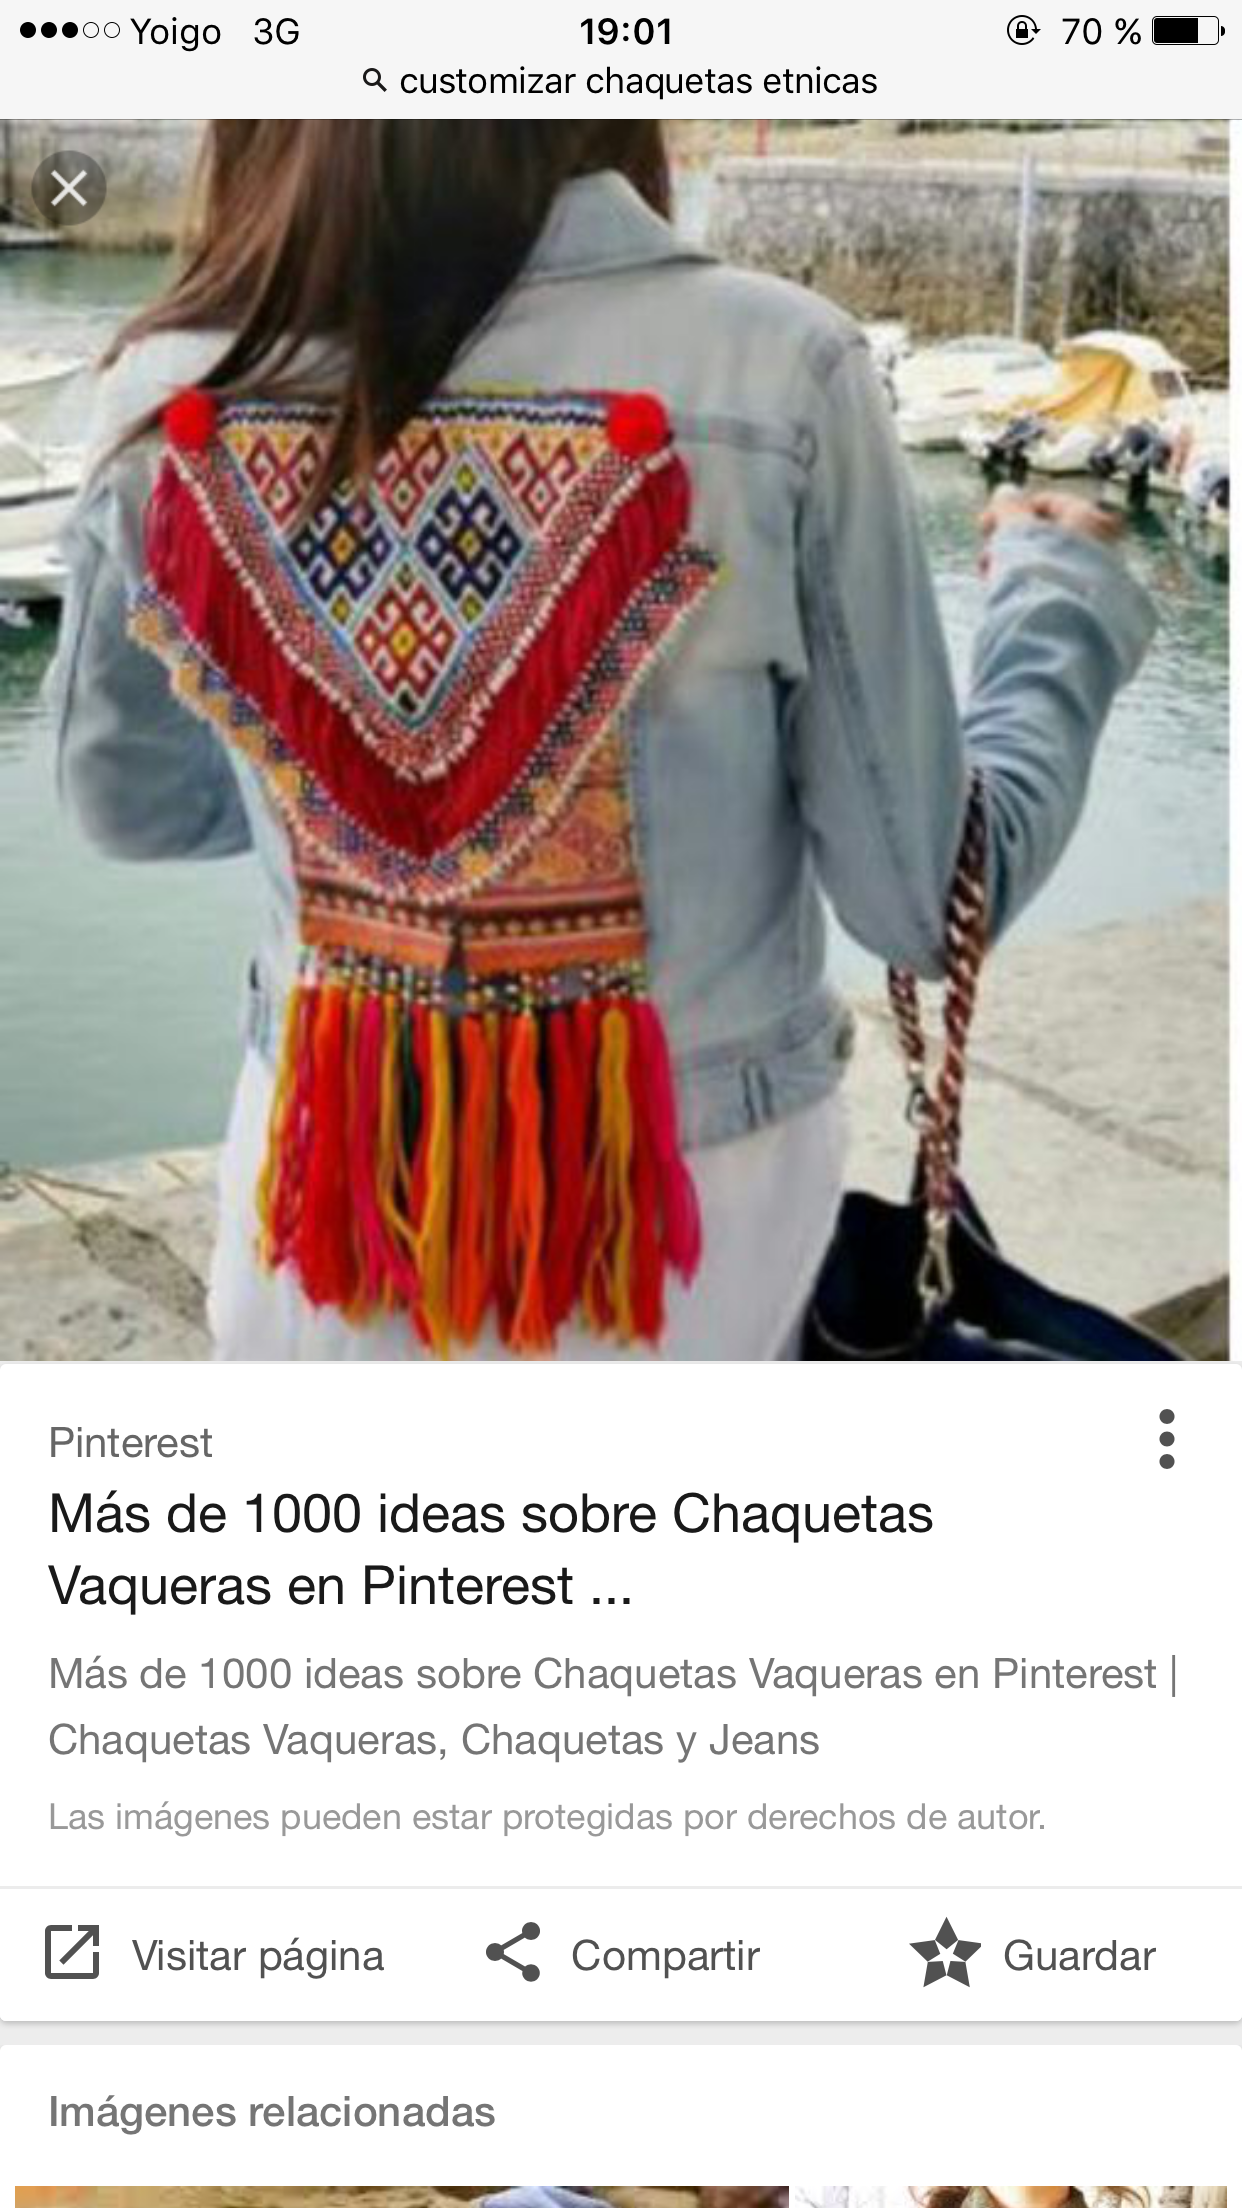 Chichi Soldout Pin Cazadora Ropa De Pinterest En Y Chaquetas 1qRpfS5xw